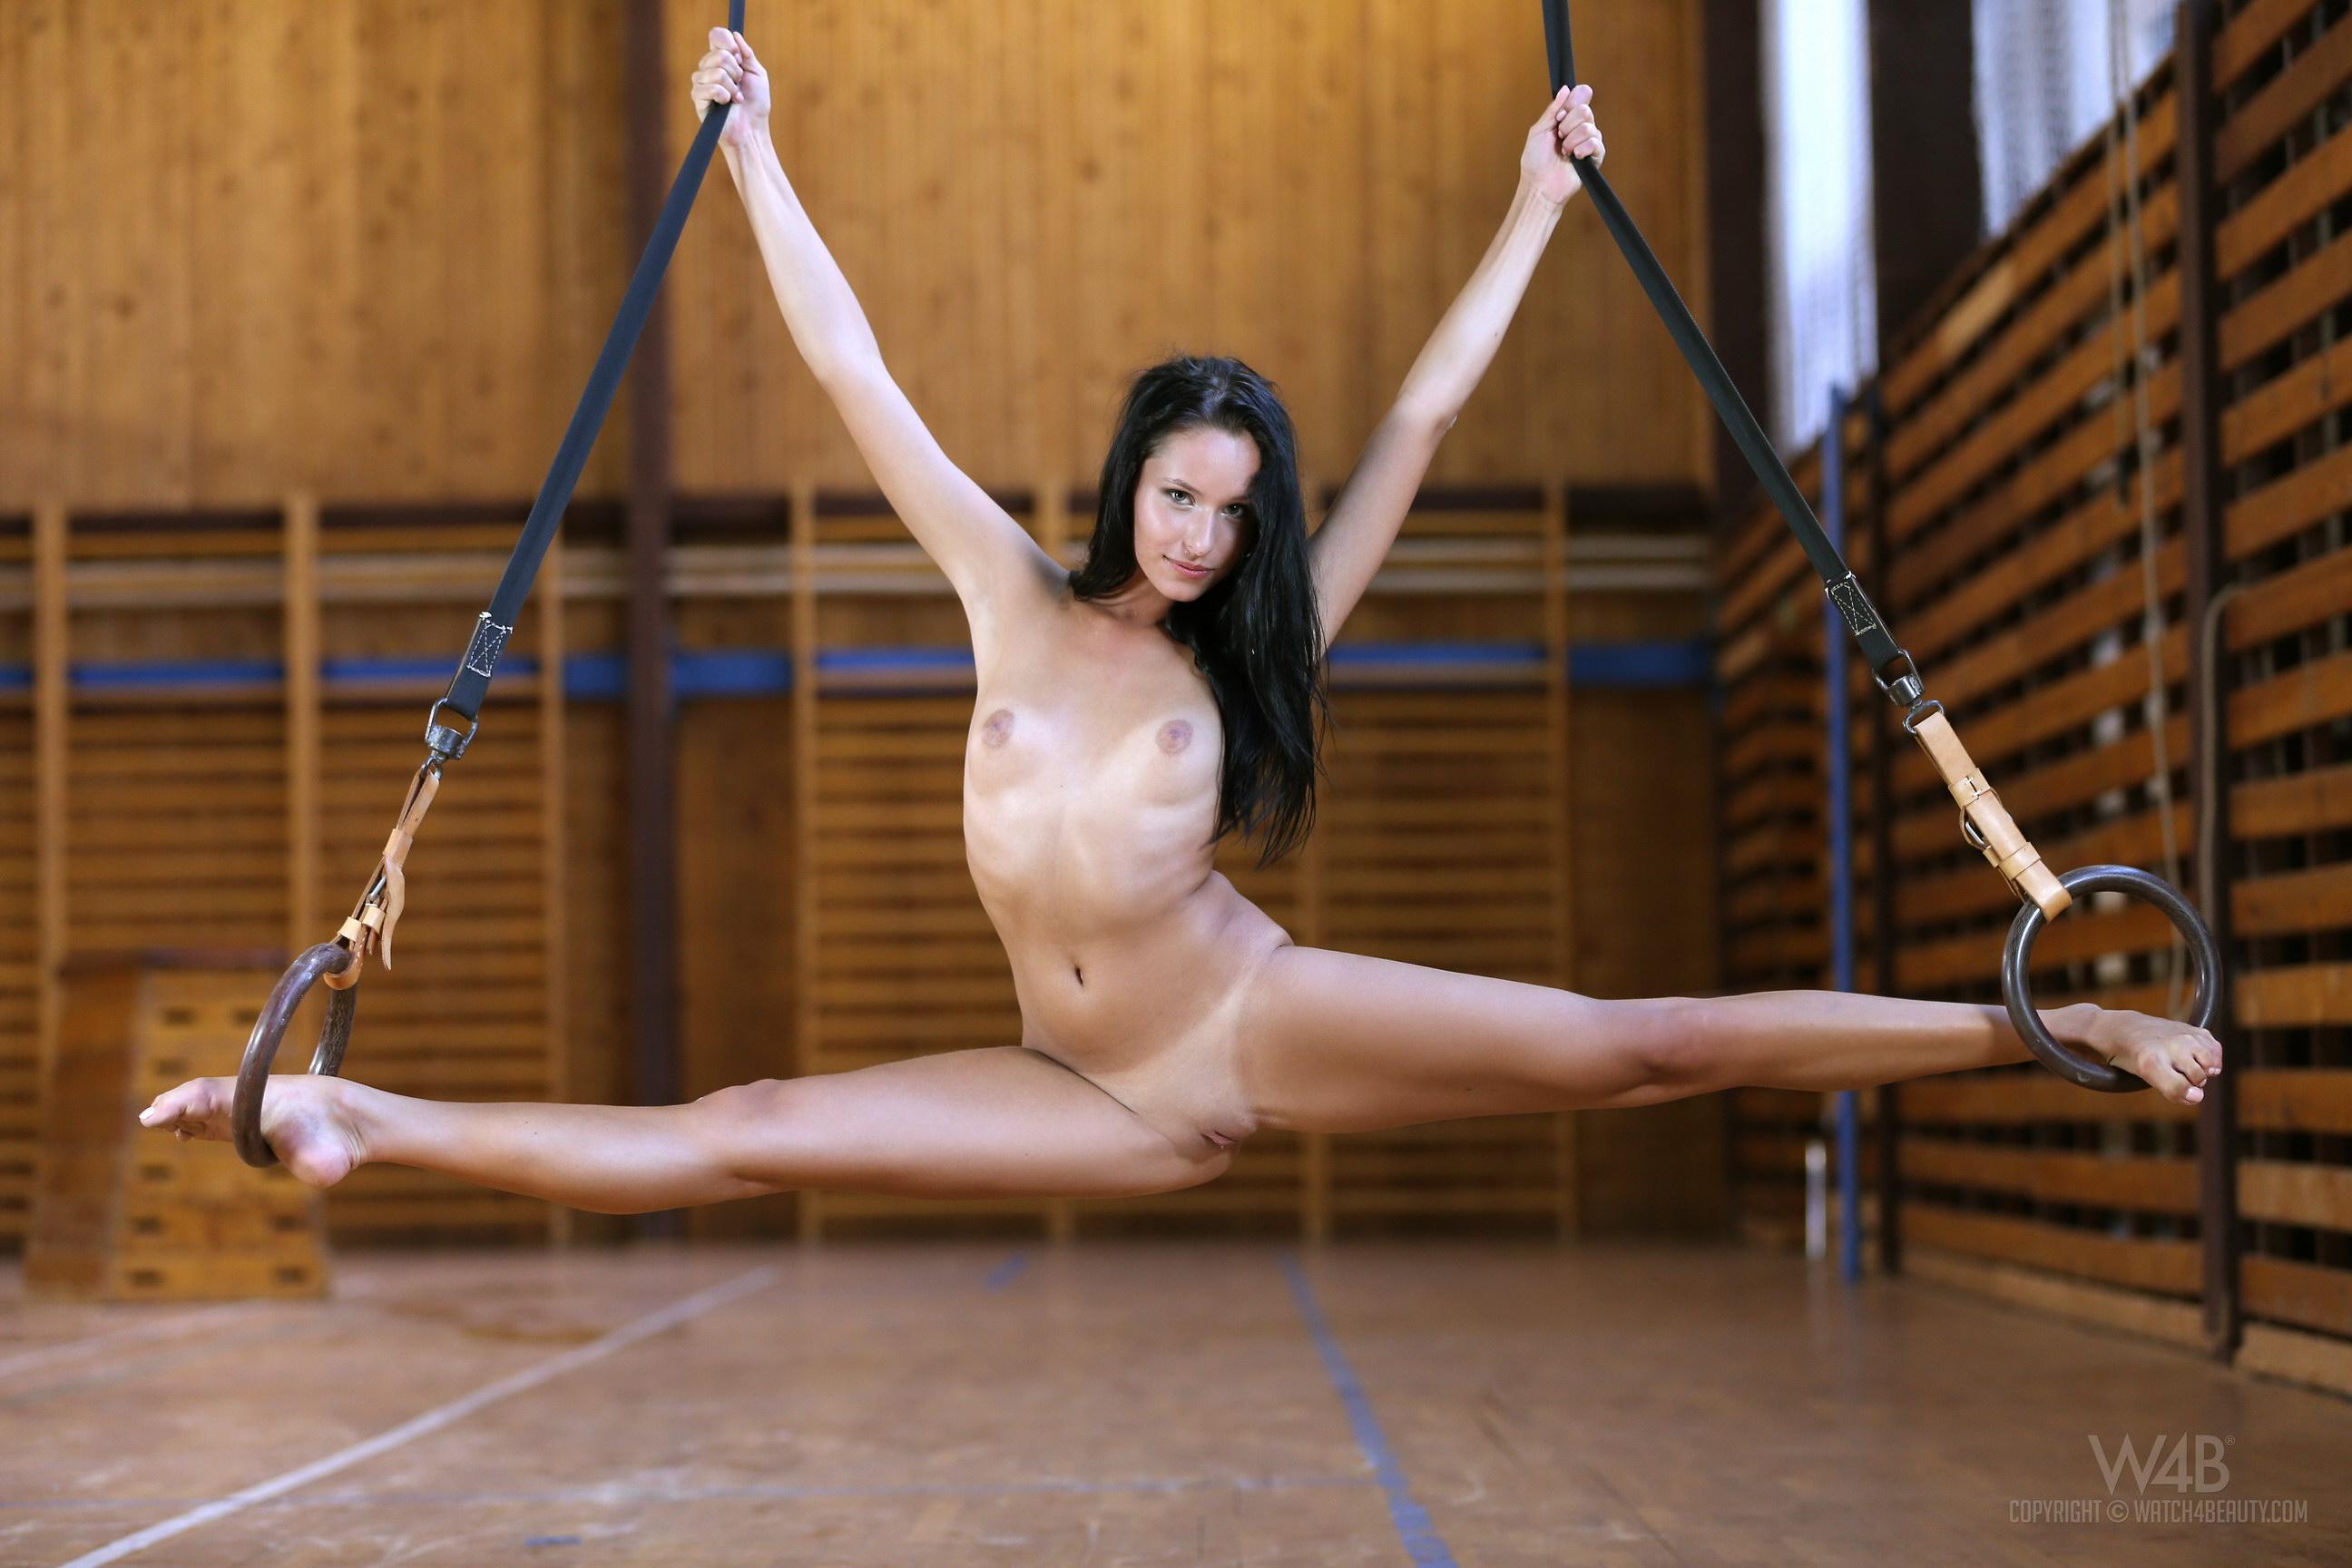 Фото гимнасток эро